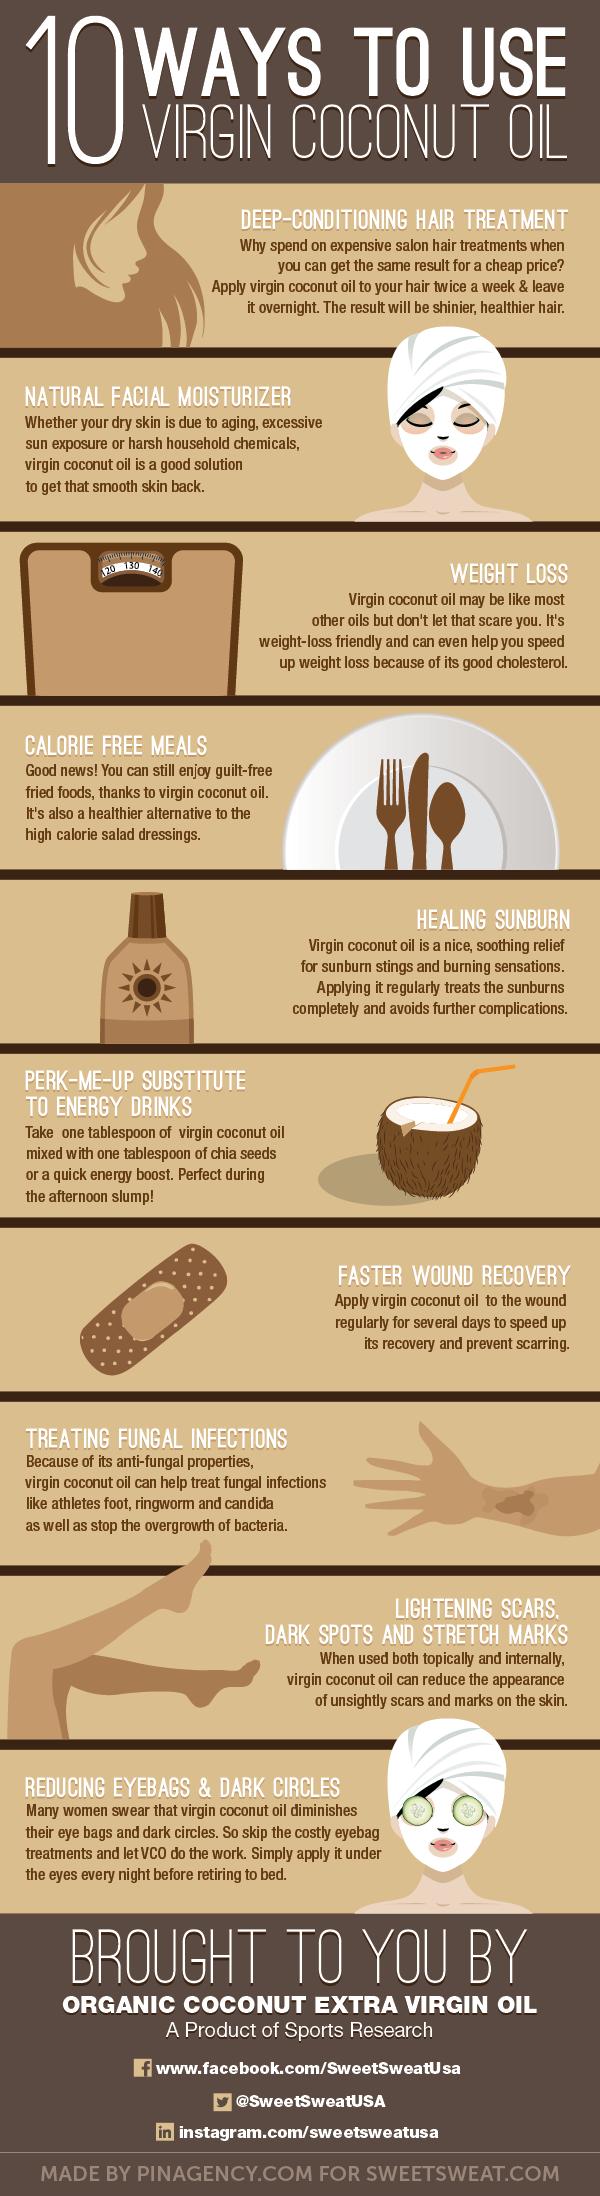 10 ways to use virgin coconut oil infographic. Black Bedroom Furniture Sets. Home Design Ideas